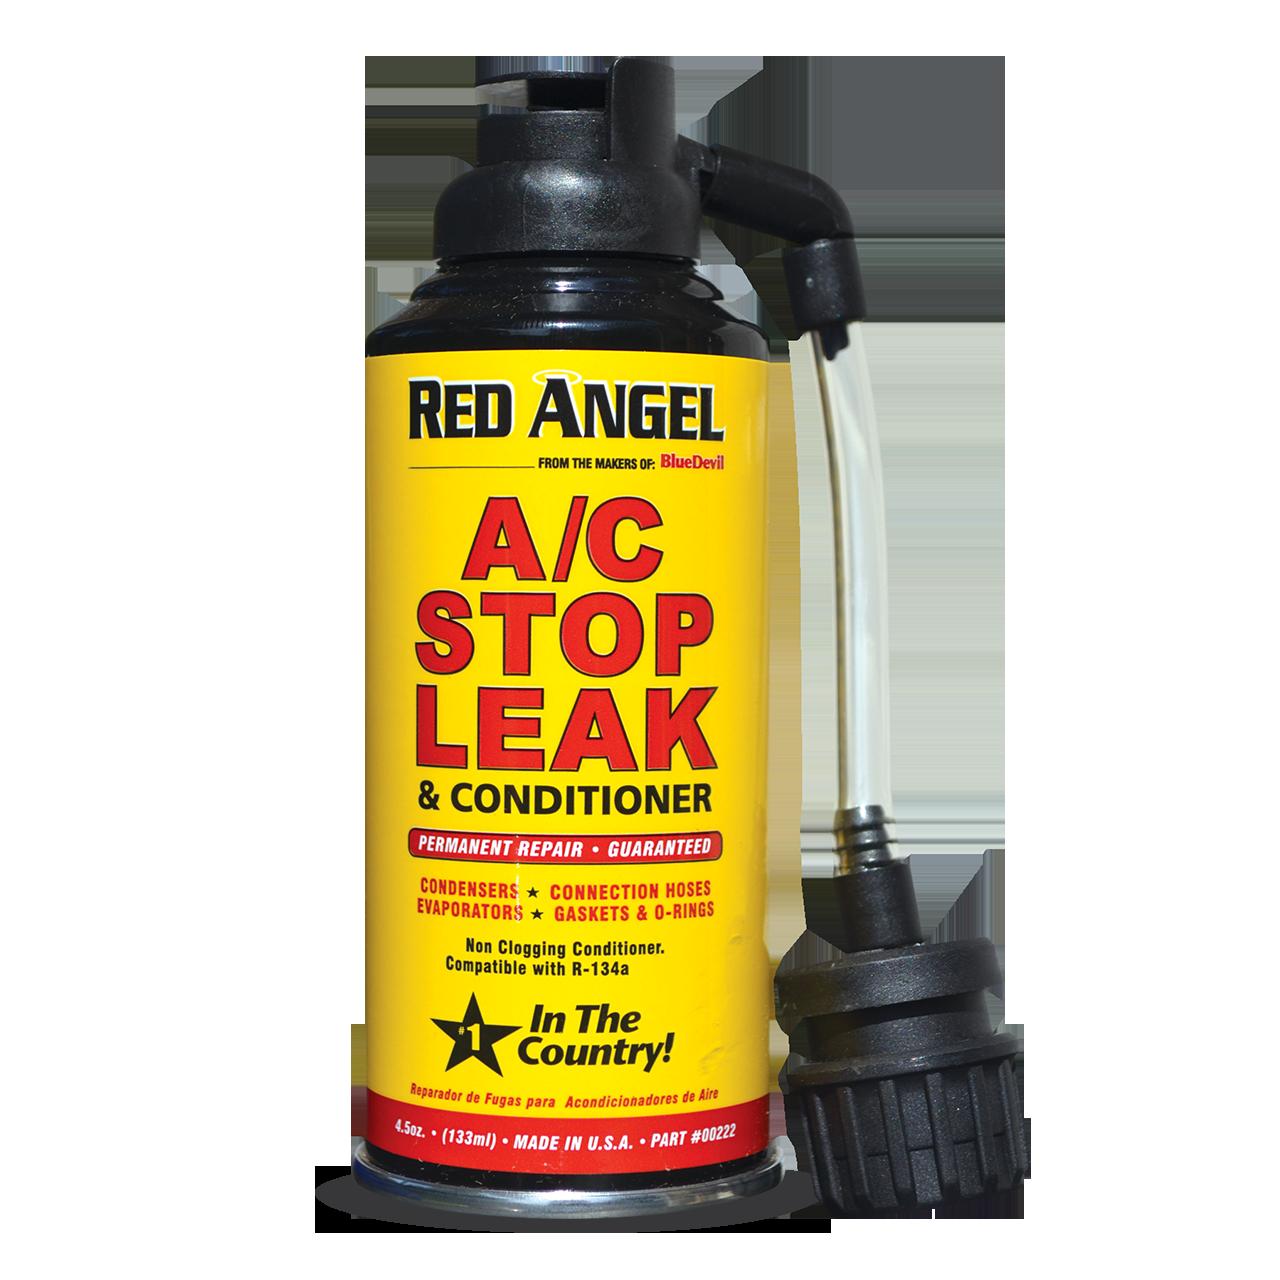 R134a Stop Leak One Shot Product BlueDevil Leak repair